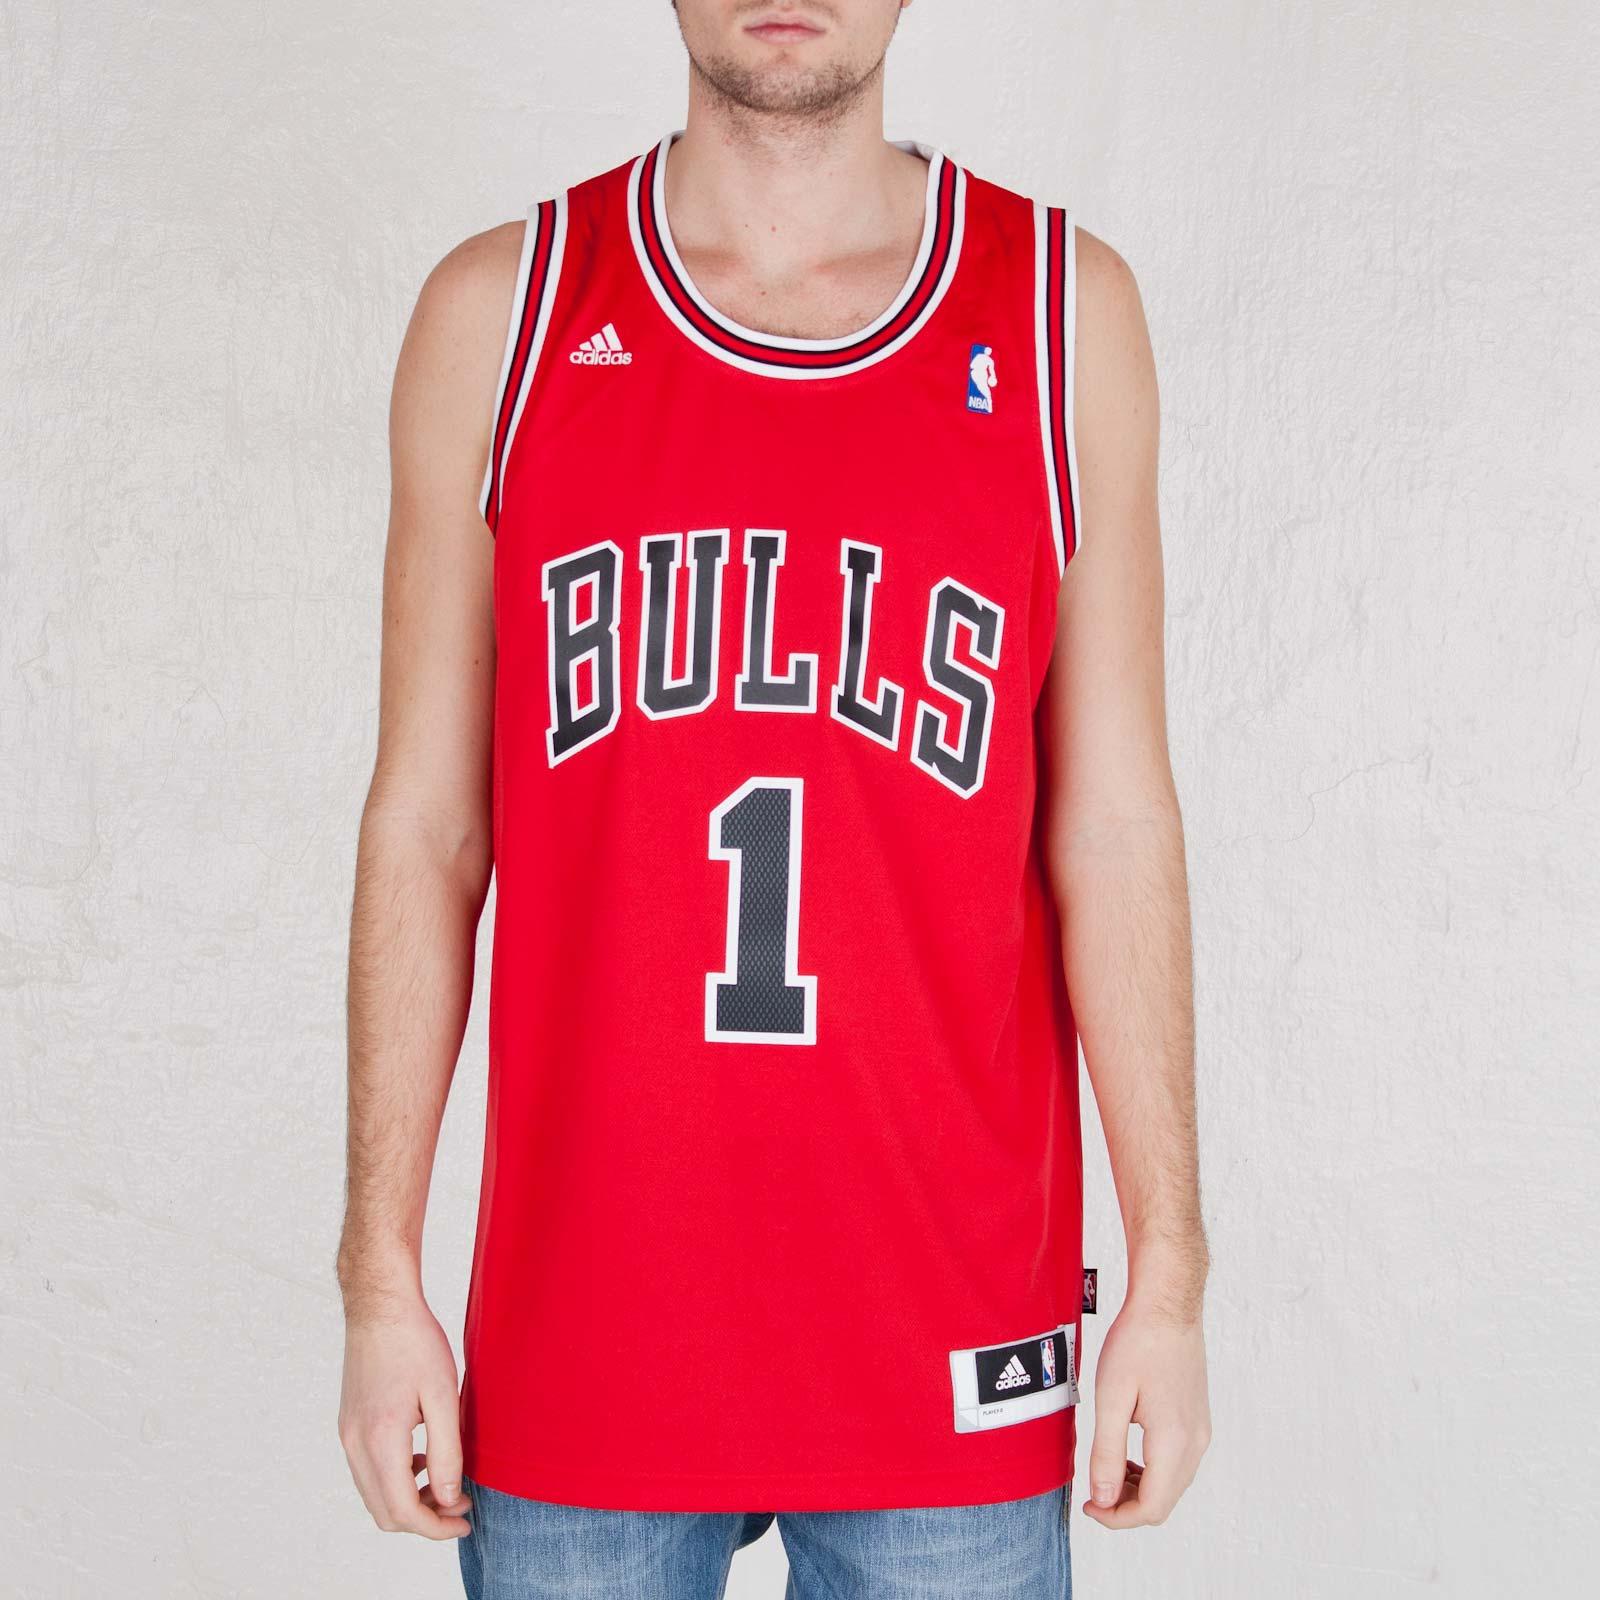 nba chicago bulls jersey uk Off 62% - www.bashhguidelines.org